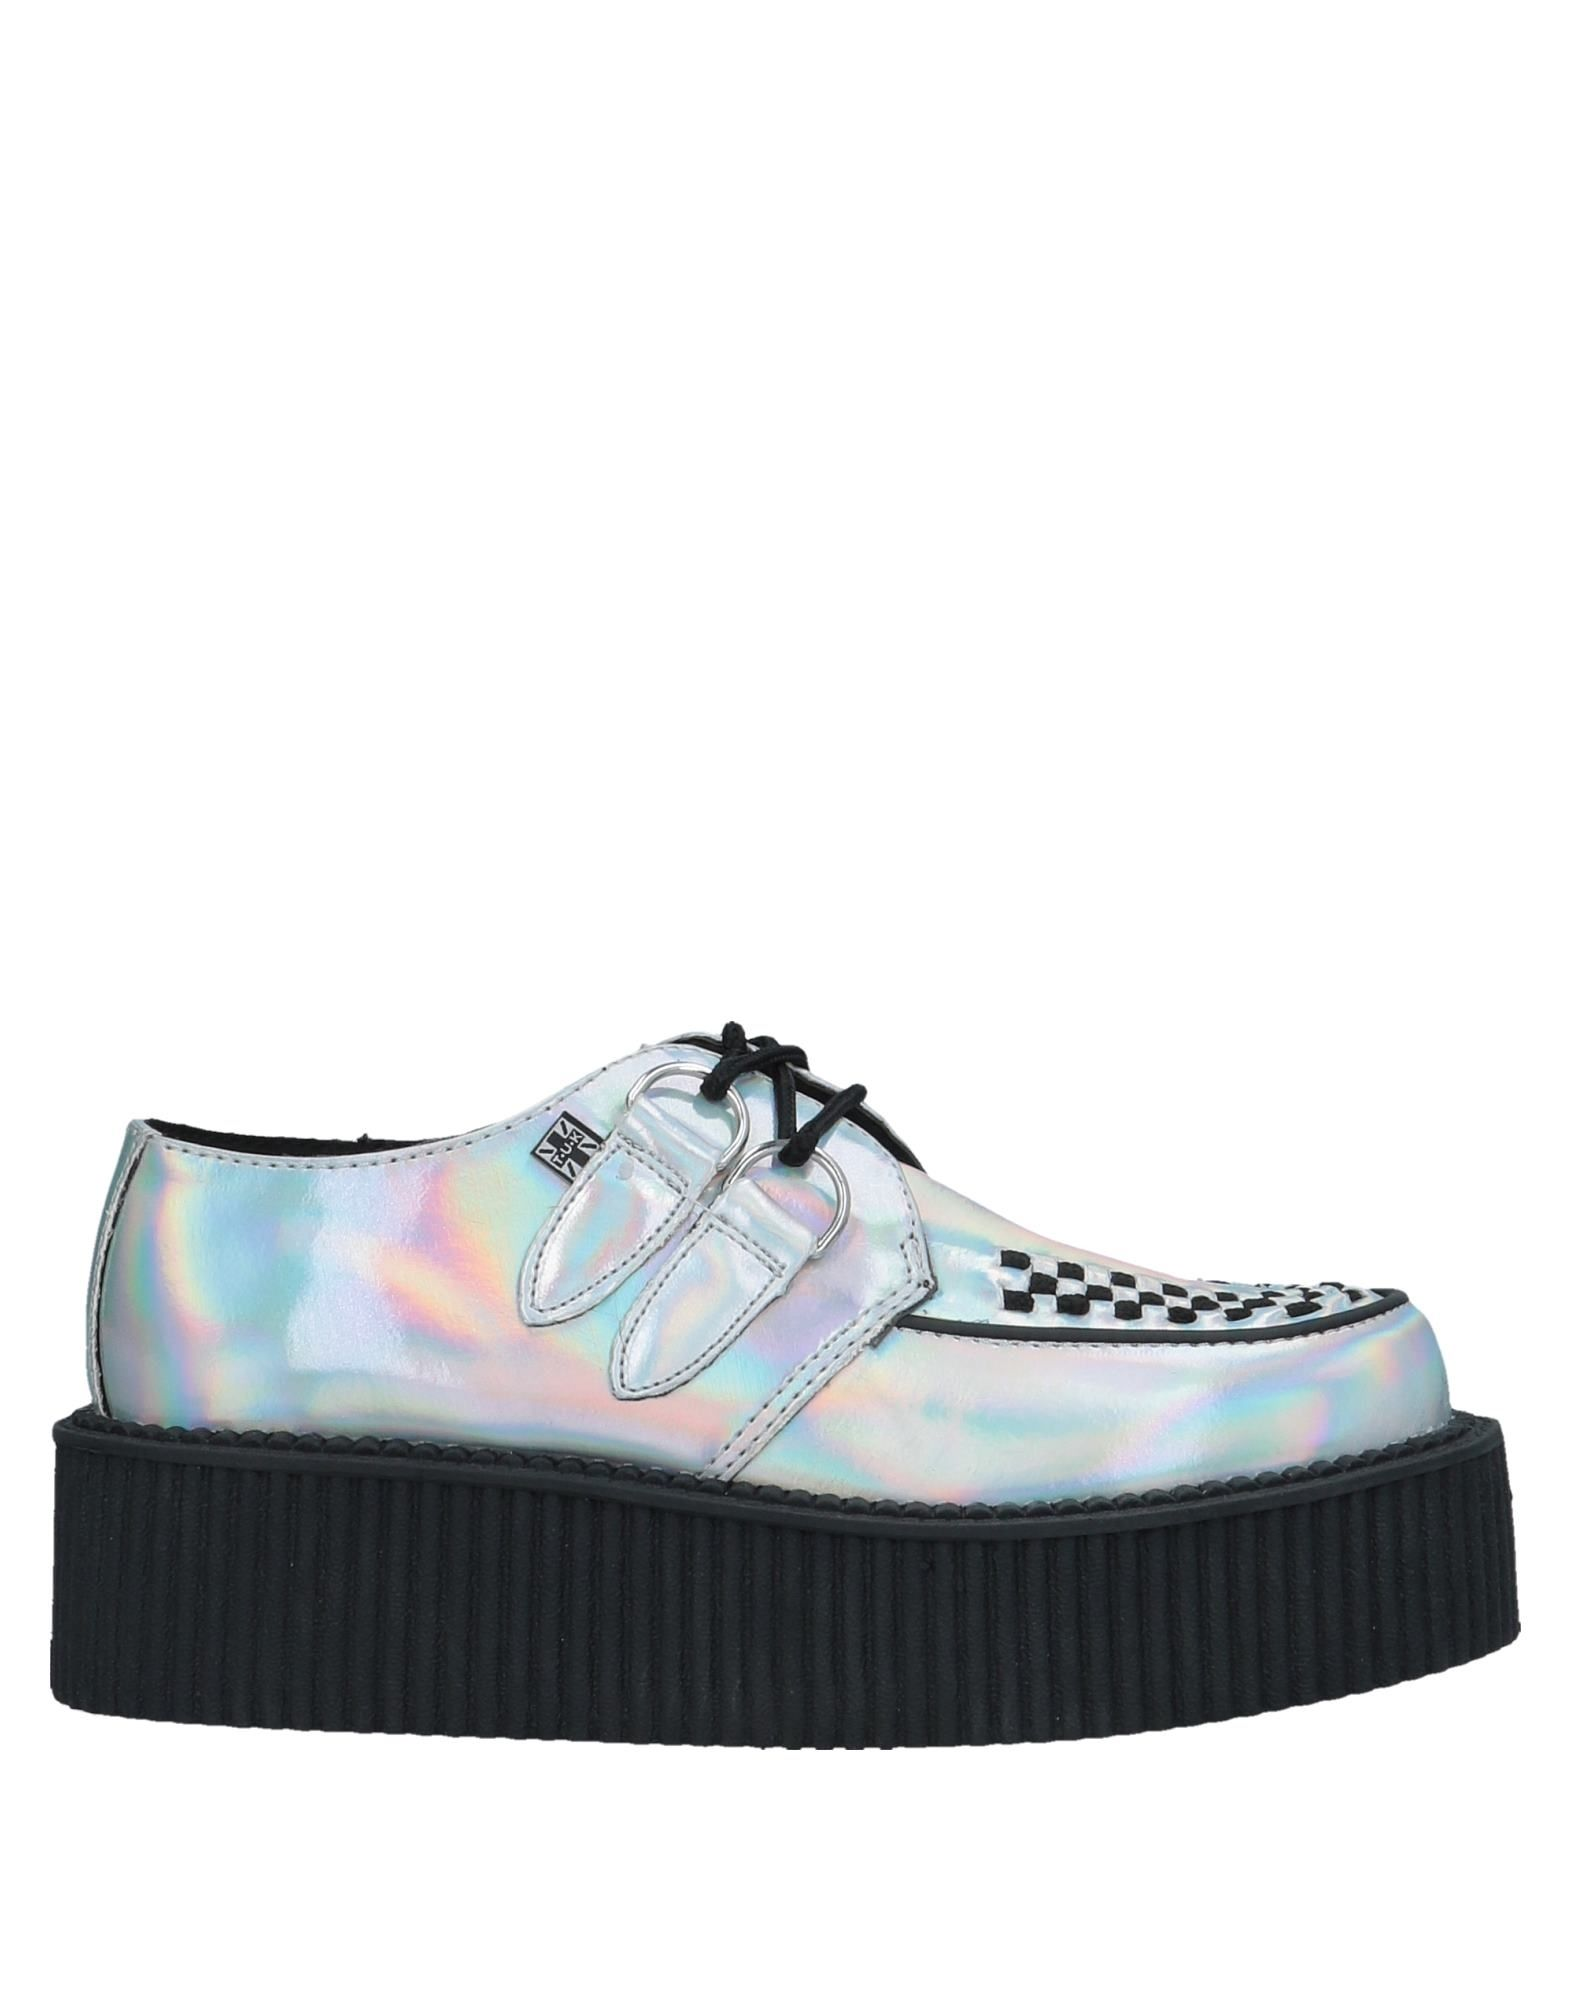 T.U.K Schnürschuhe Damen  11528187WH Gute Qualität beliebte Schuhe